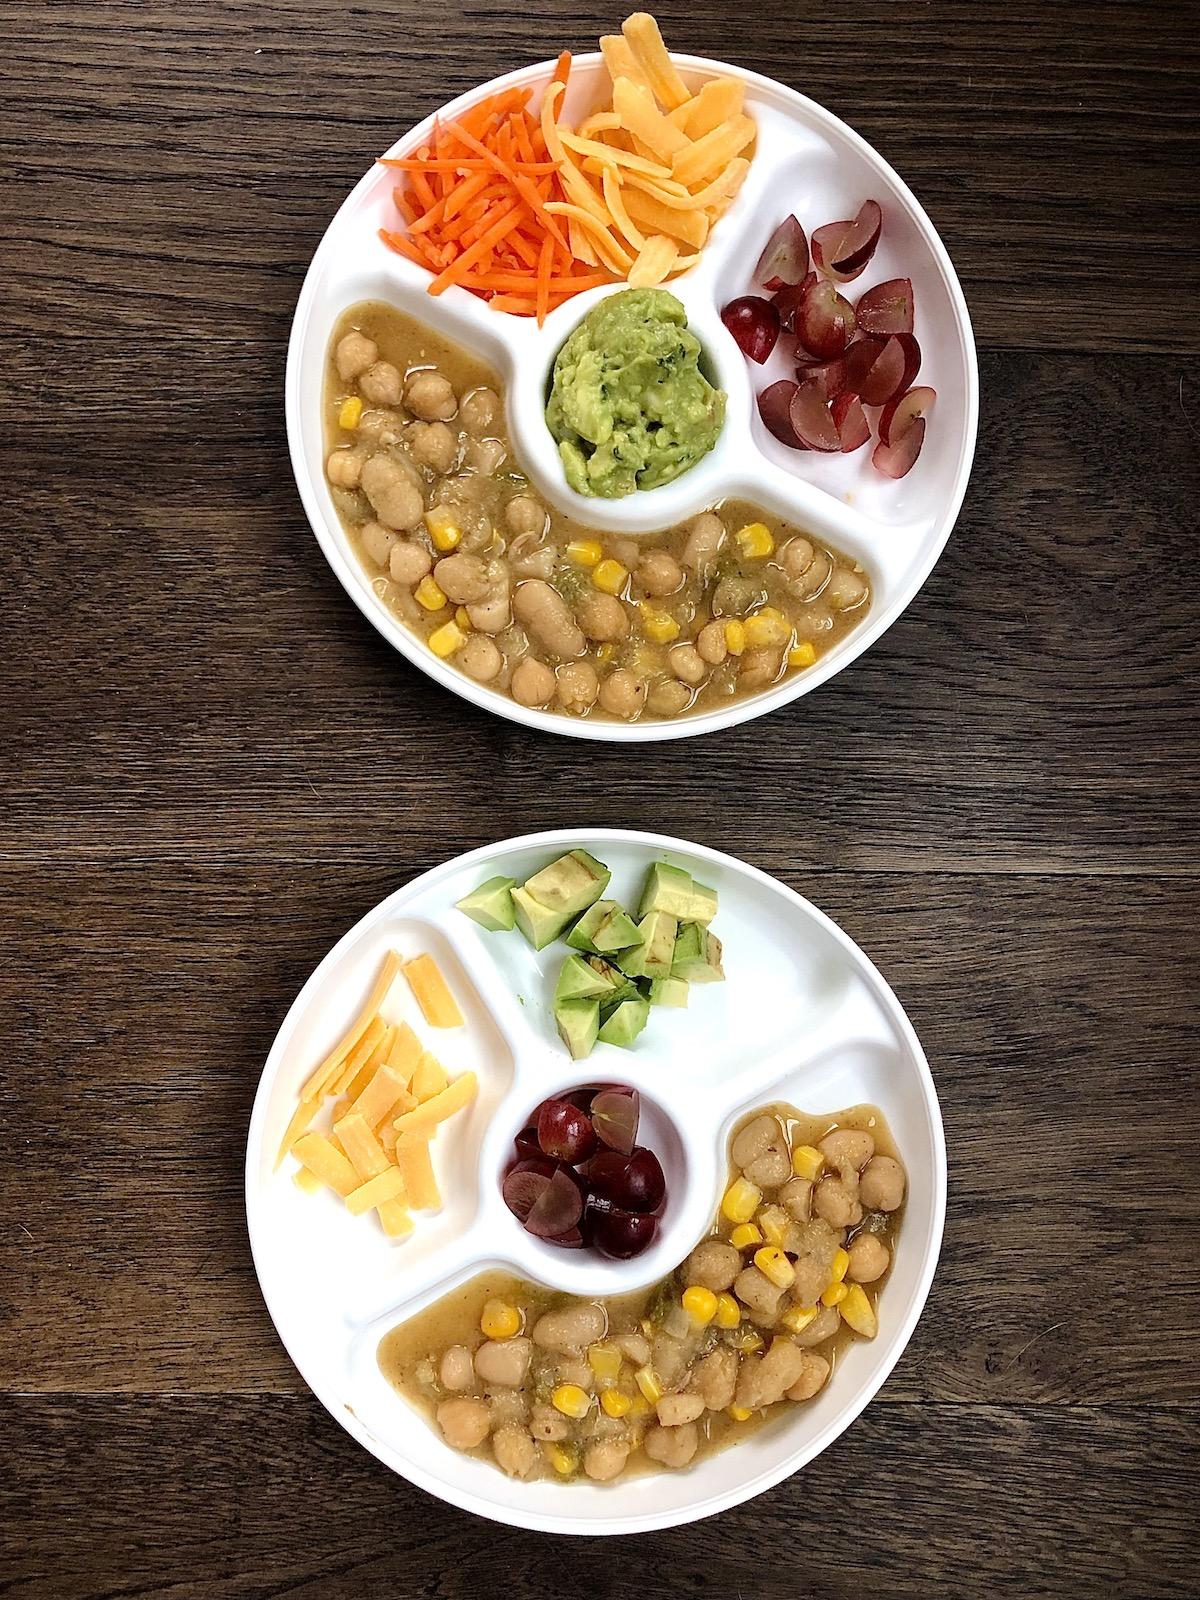 Toddler plates of vegan white chili beans